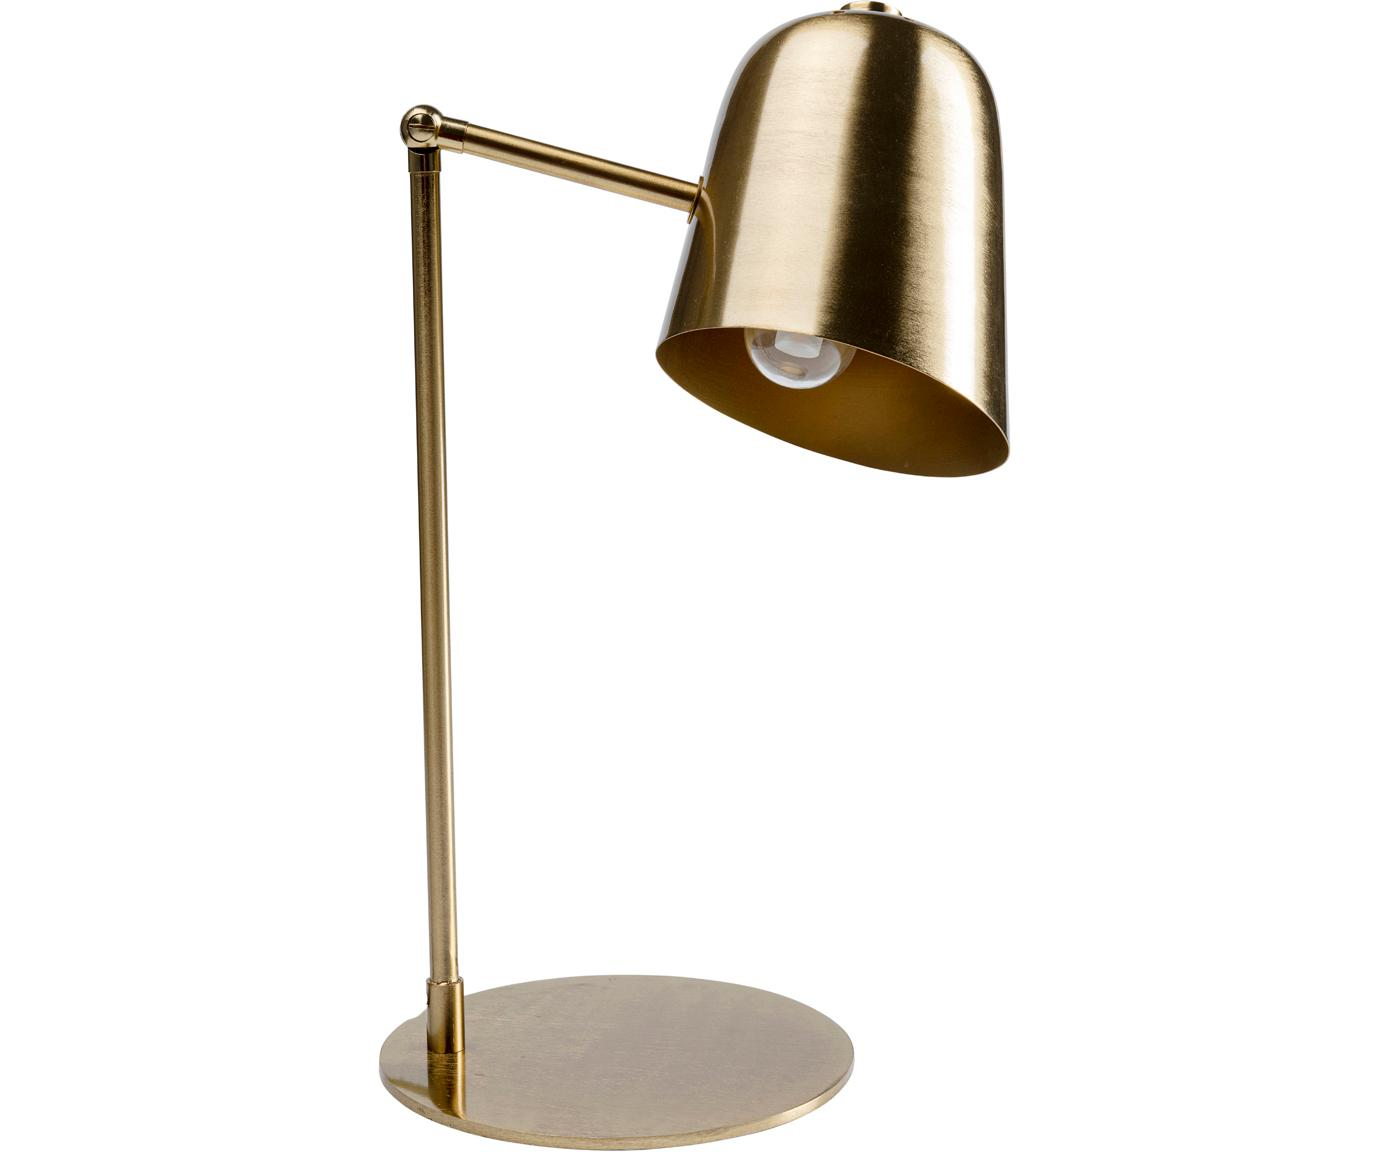 Grosse Retro-Schreibtischlampe Clive, Lampenschirm: Stahl, vermessingt, Messingfarben, 27 x 56 cm